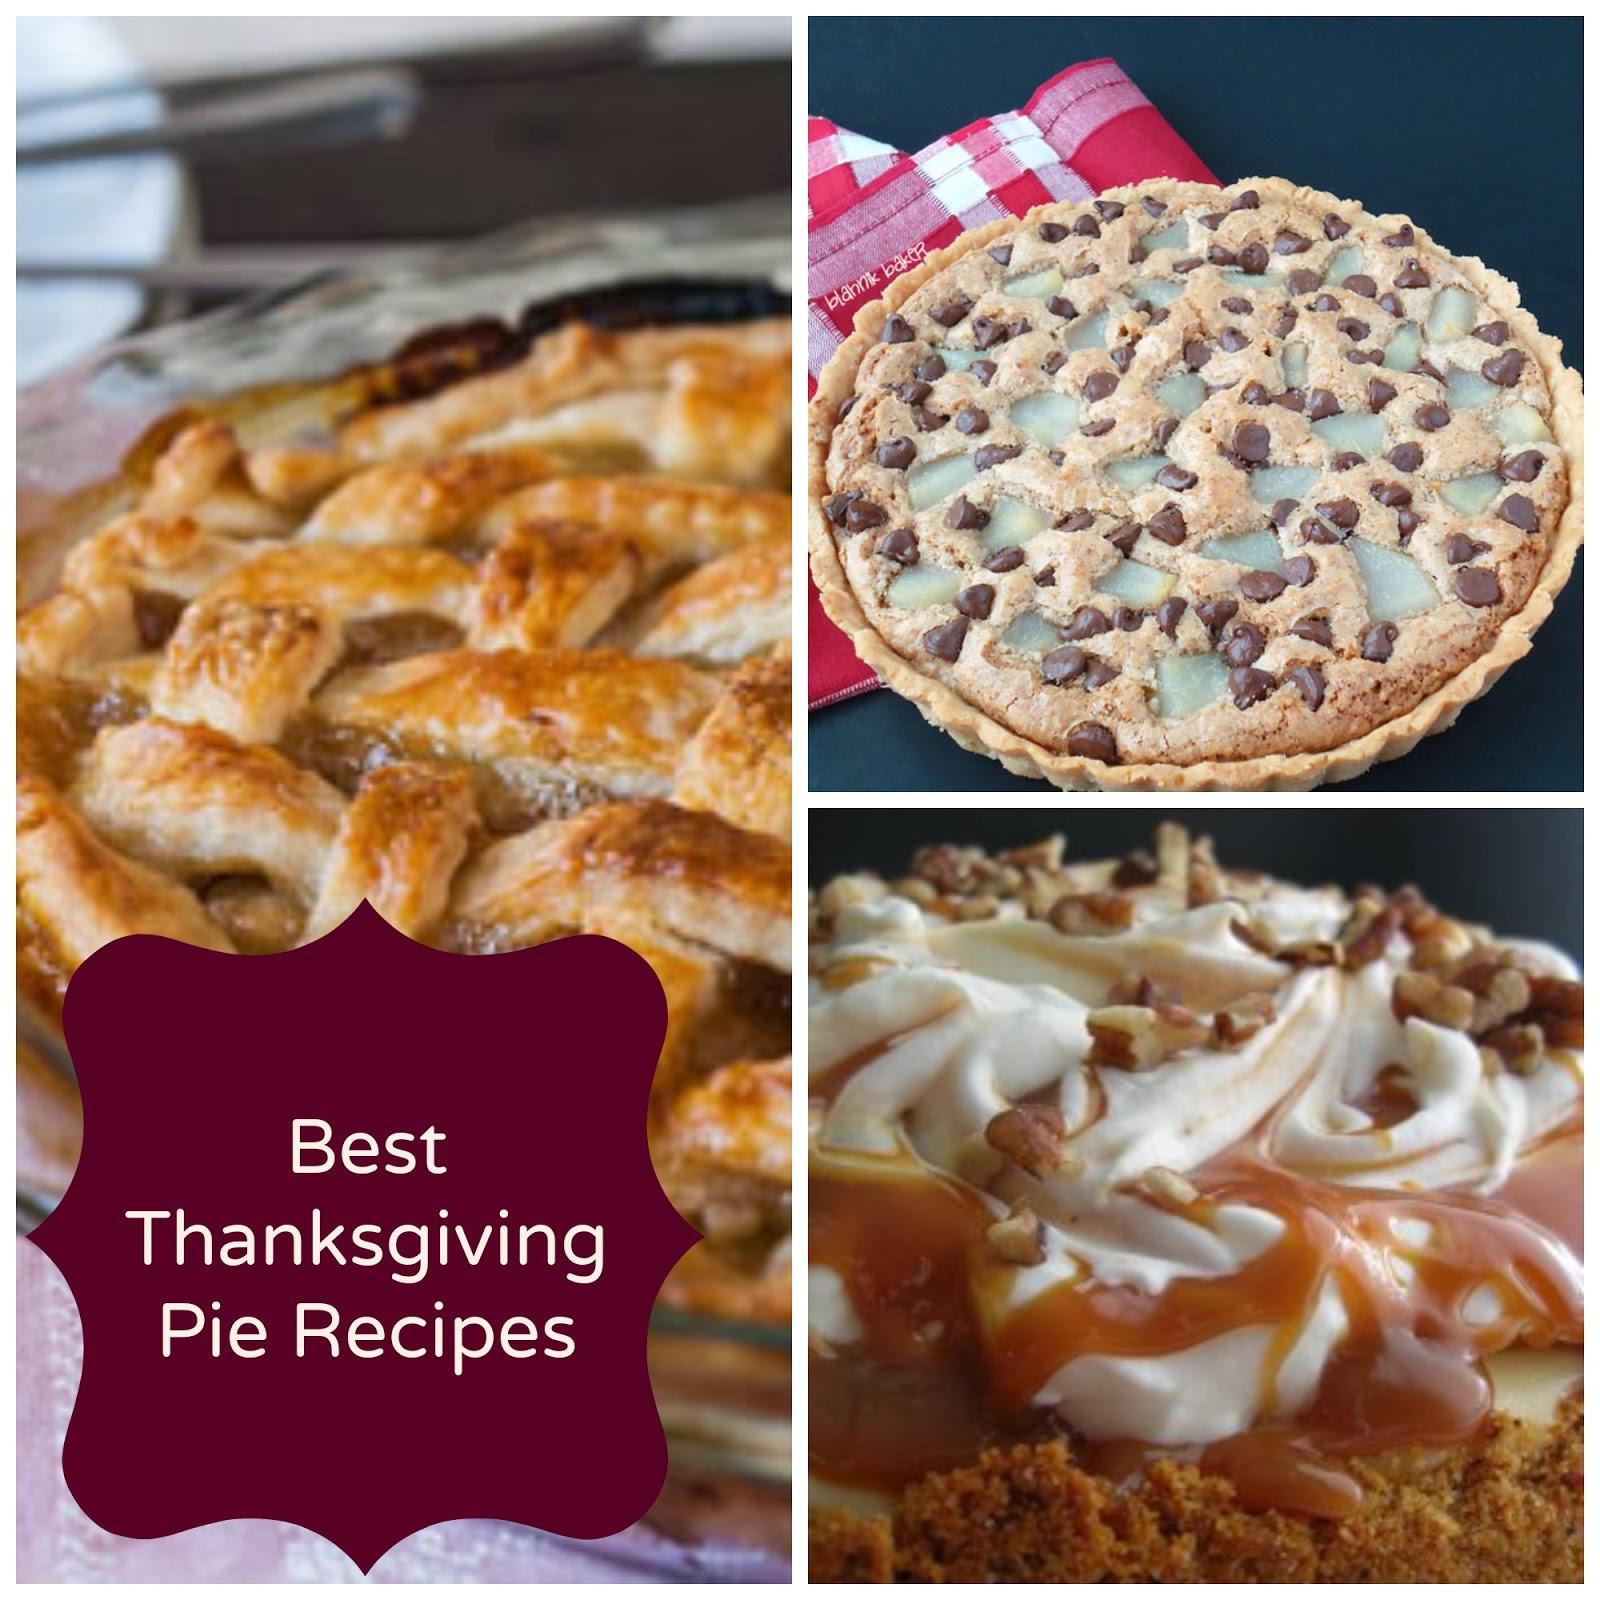 Best Thanksgiving Pies  Decorating Pennies Best Thanksgiving Pie Recipes